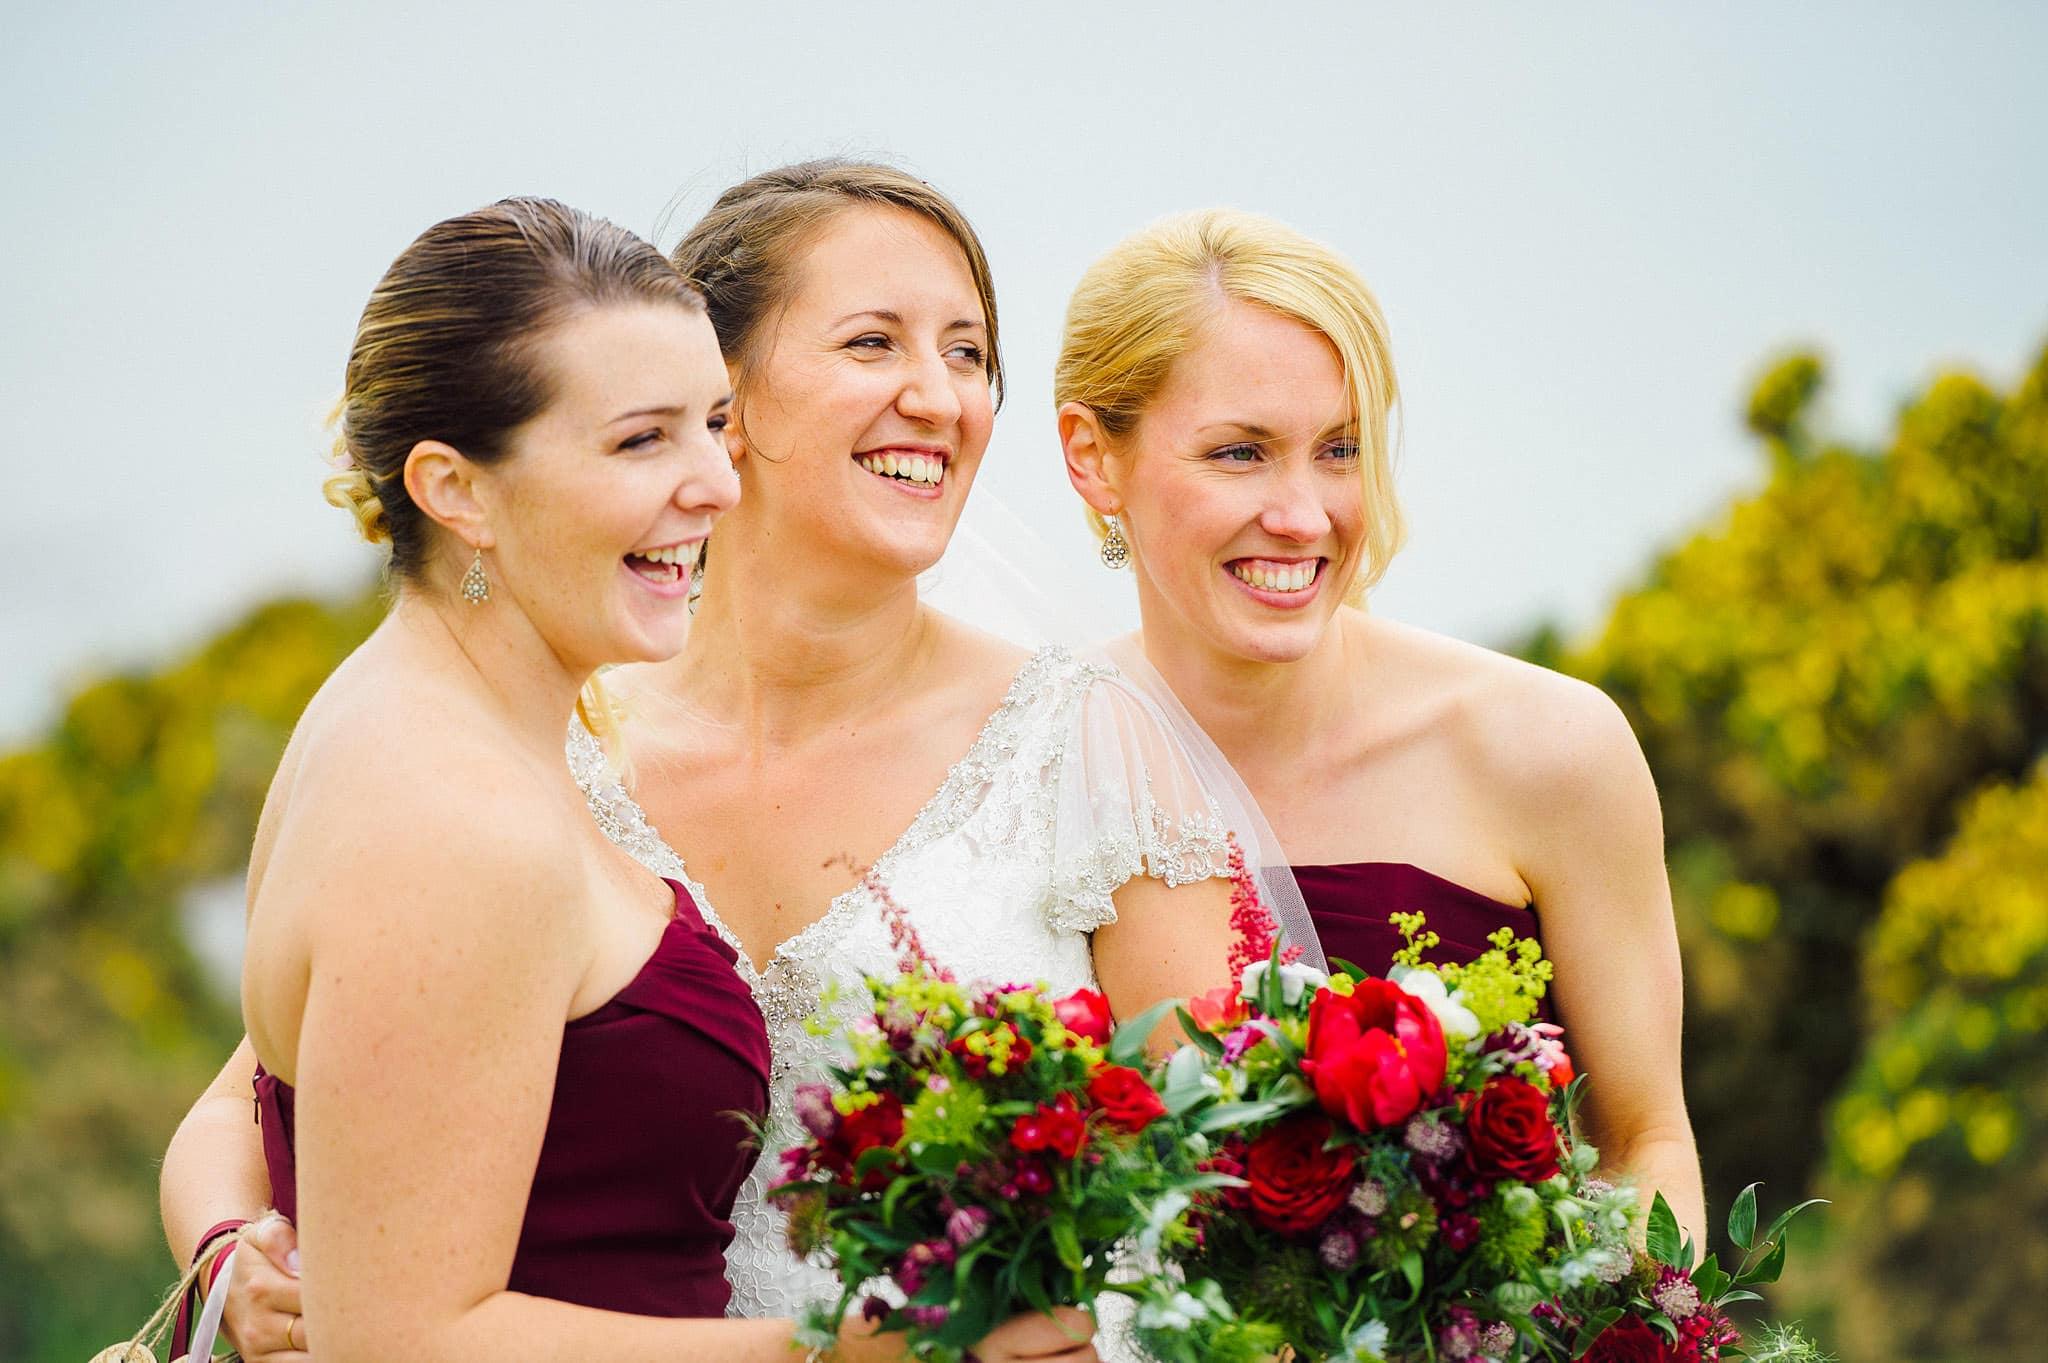 wedding-photographer-aberystwyth-wales (155)